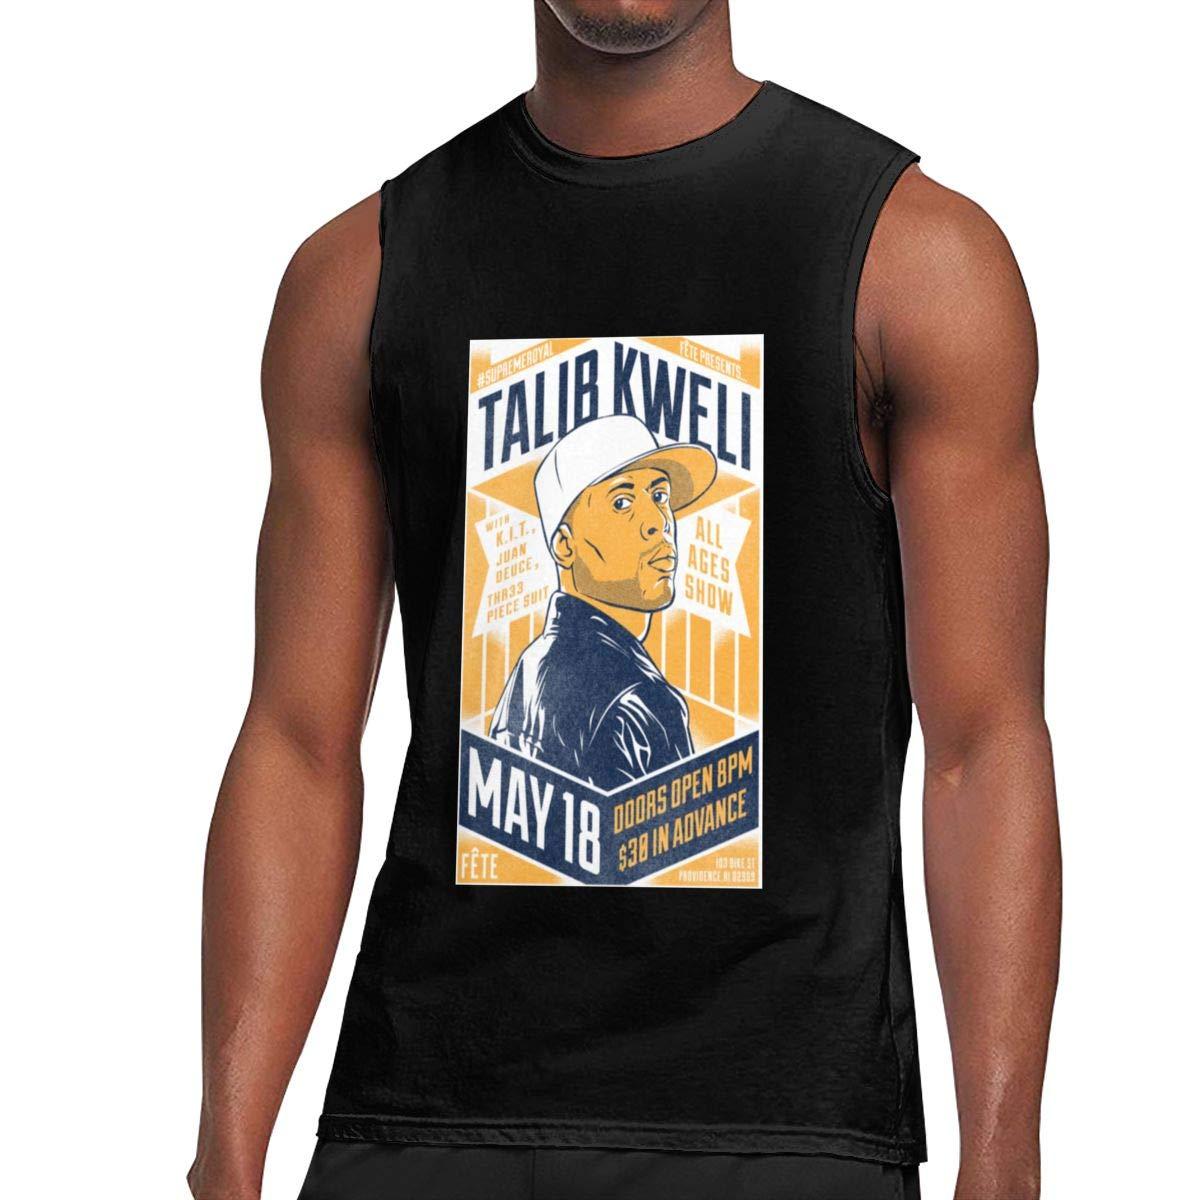 Seuriamin Talib Kweli Prisoner Of Conscious S Basic Athletic Sleeveless Muscle Short Sleev